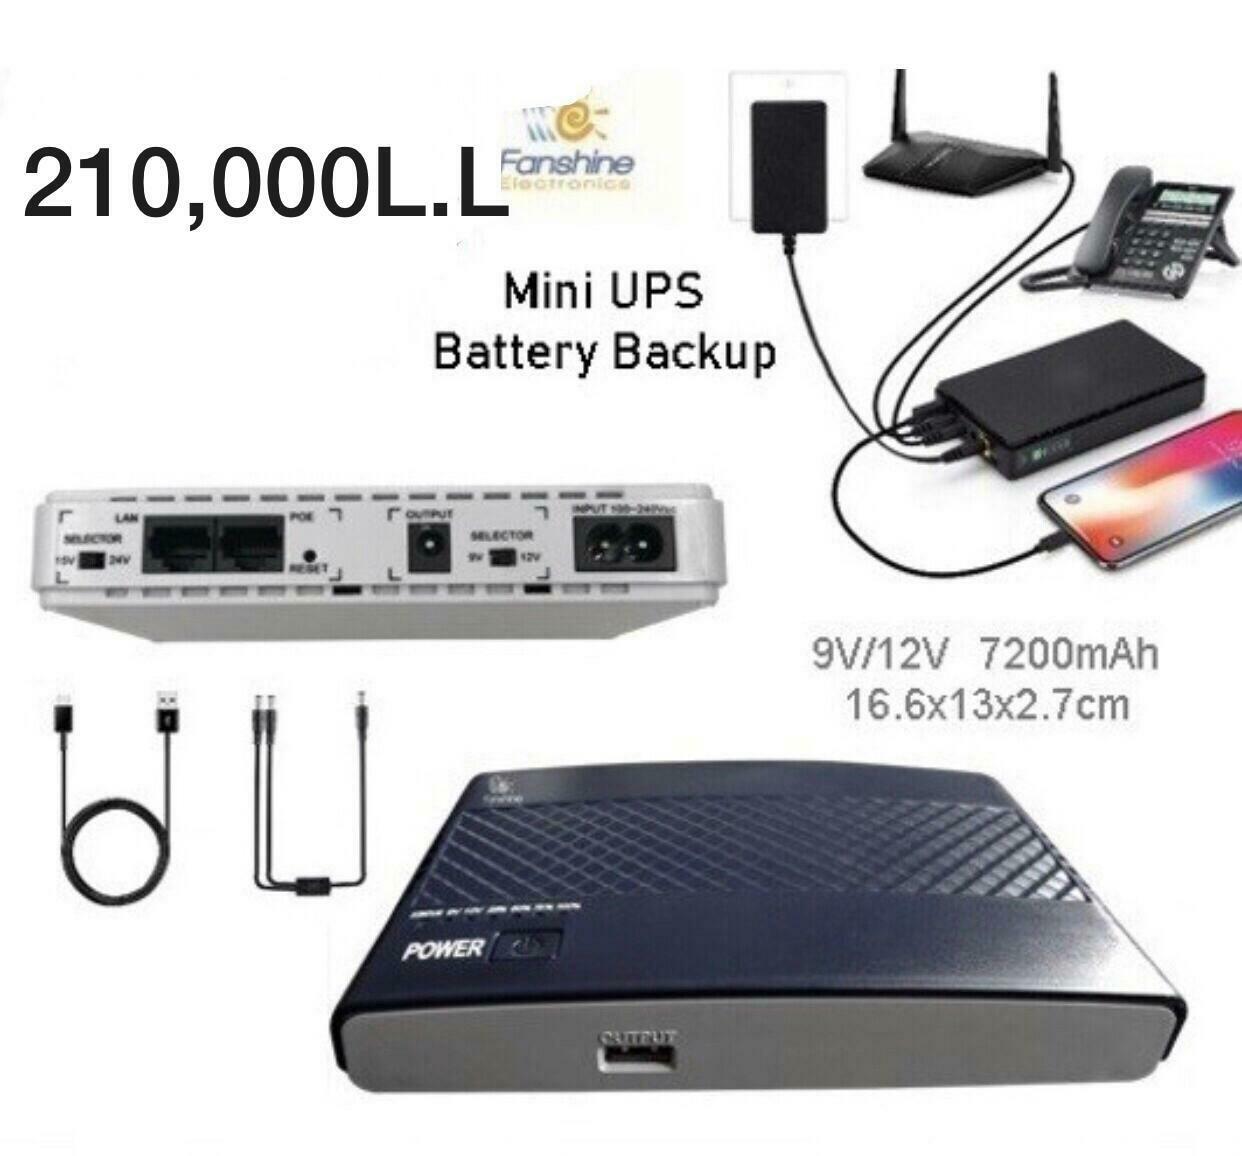 Mini UPS Battery Backup